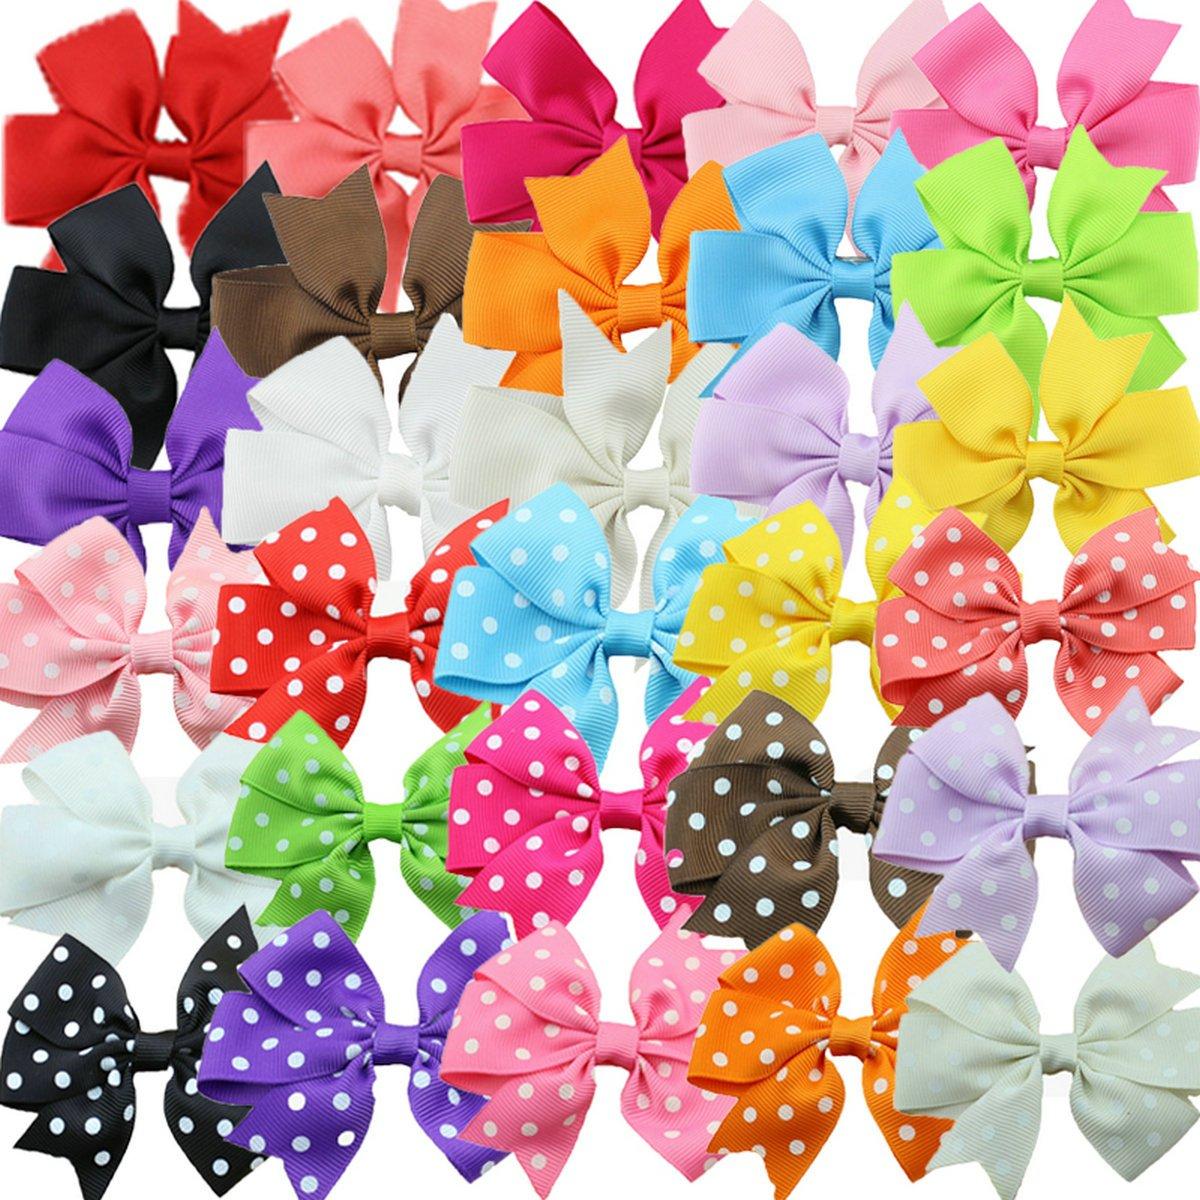 Grosgrain Ribbon Hair Bows Alligator Hair Clips for Baby Girl Toddlers Kids (15 solid color + 15 polka dot hair bows) habibee